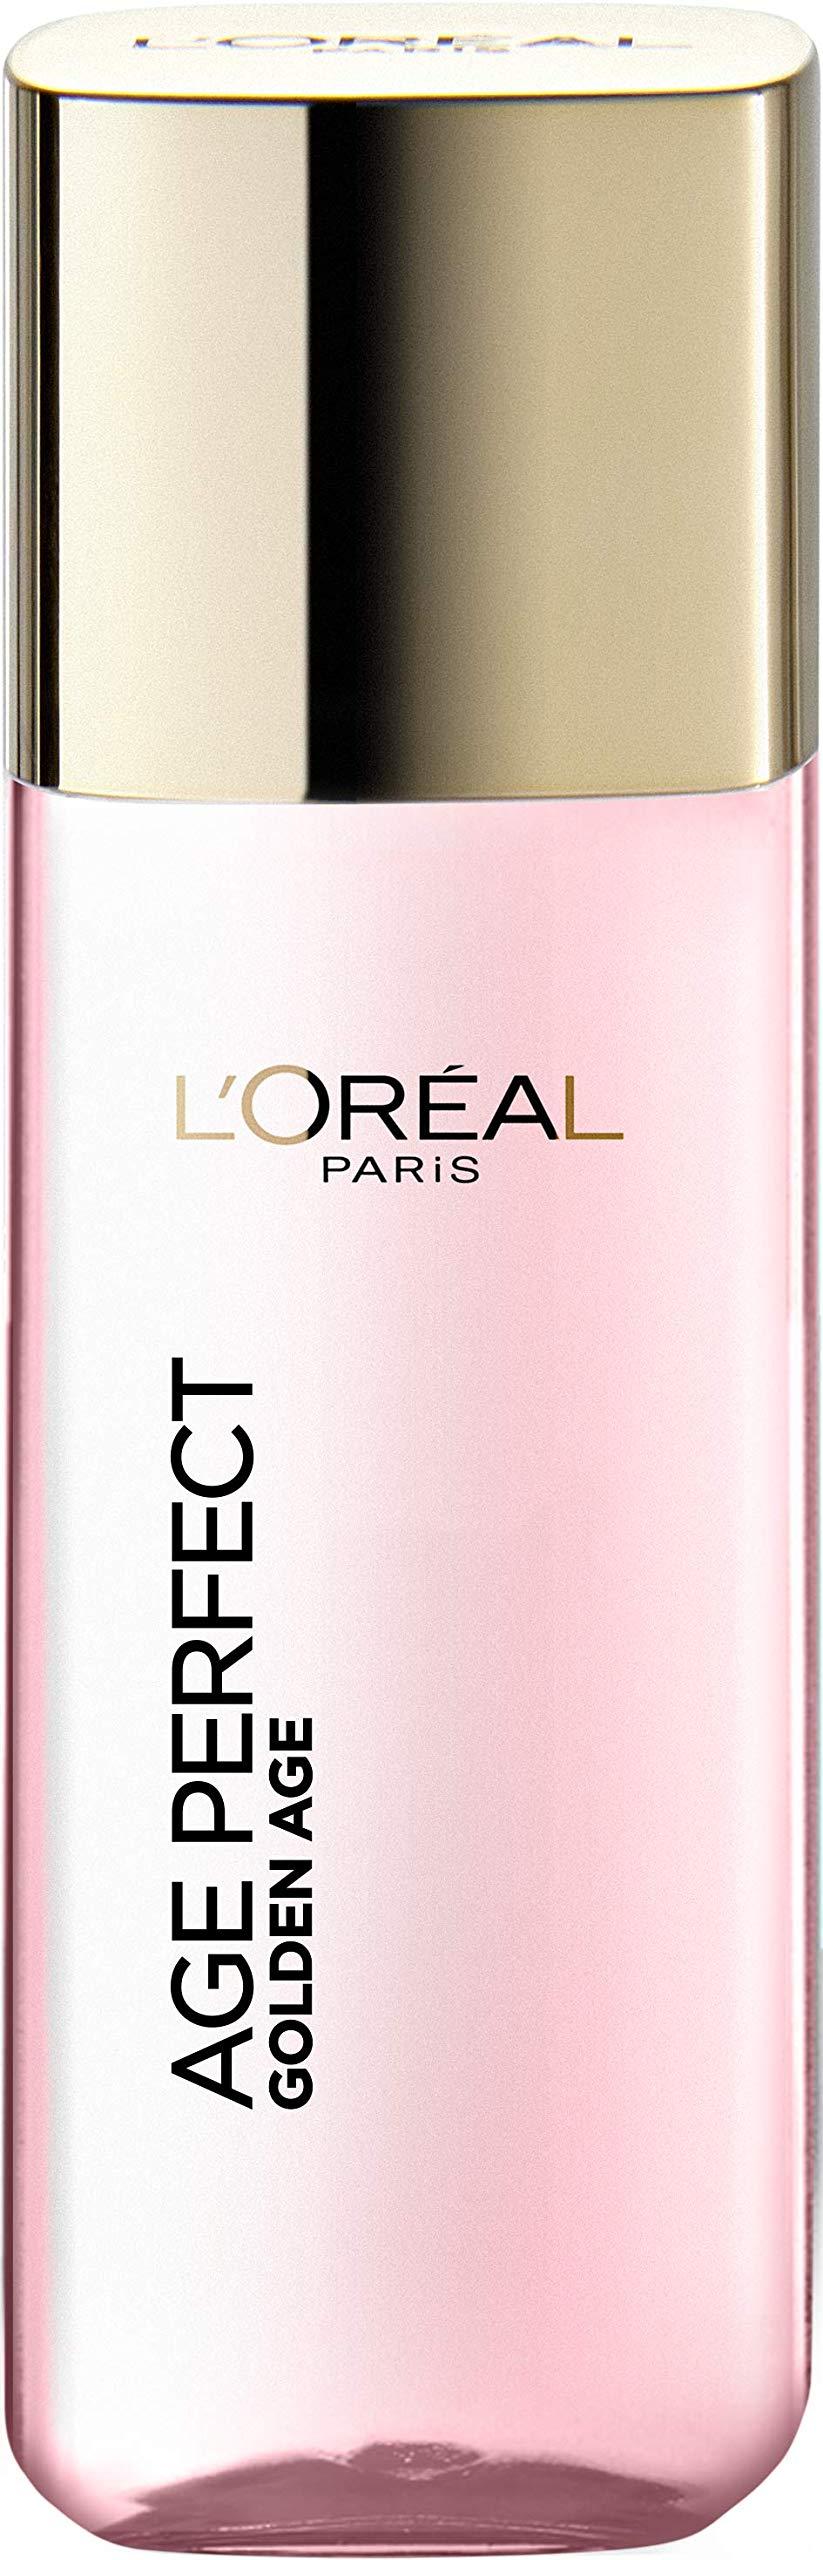 L'Oreal Paris Age Perfect Radiance Serum Loción diaria de Oro 125 ml